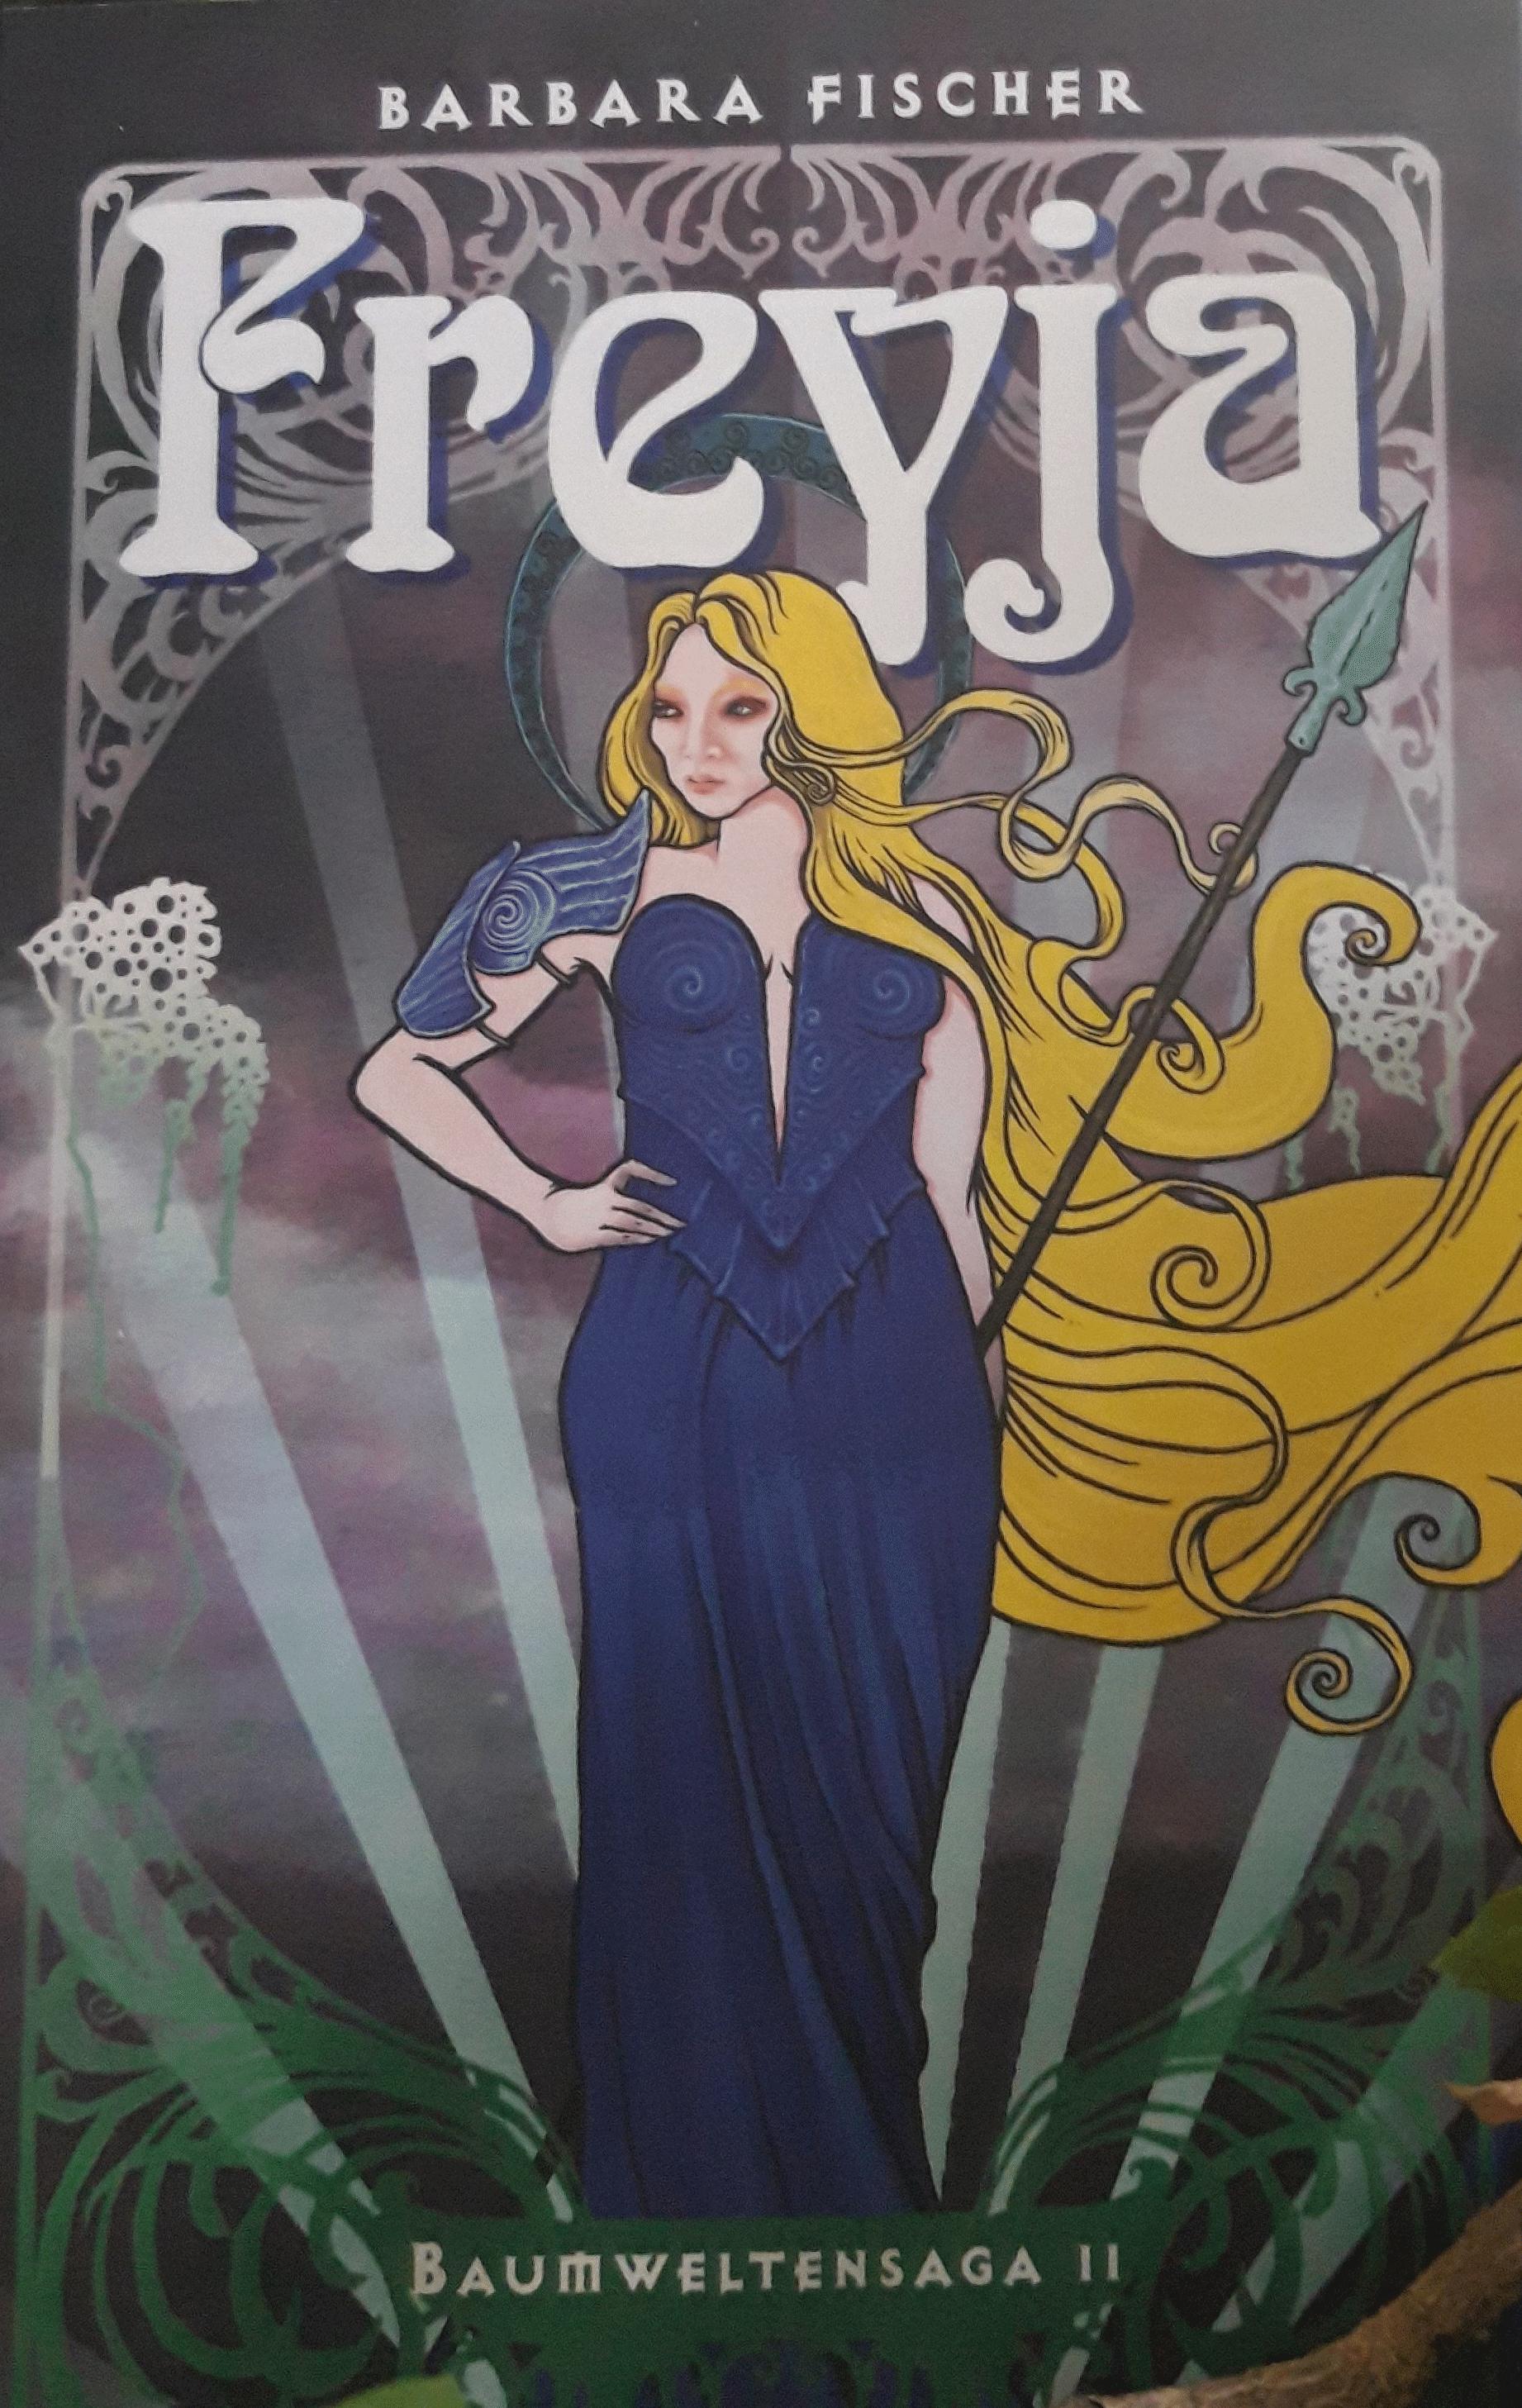 Freyja01